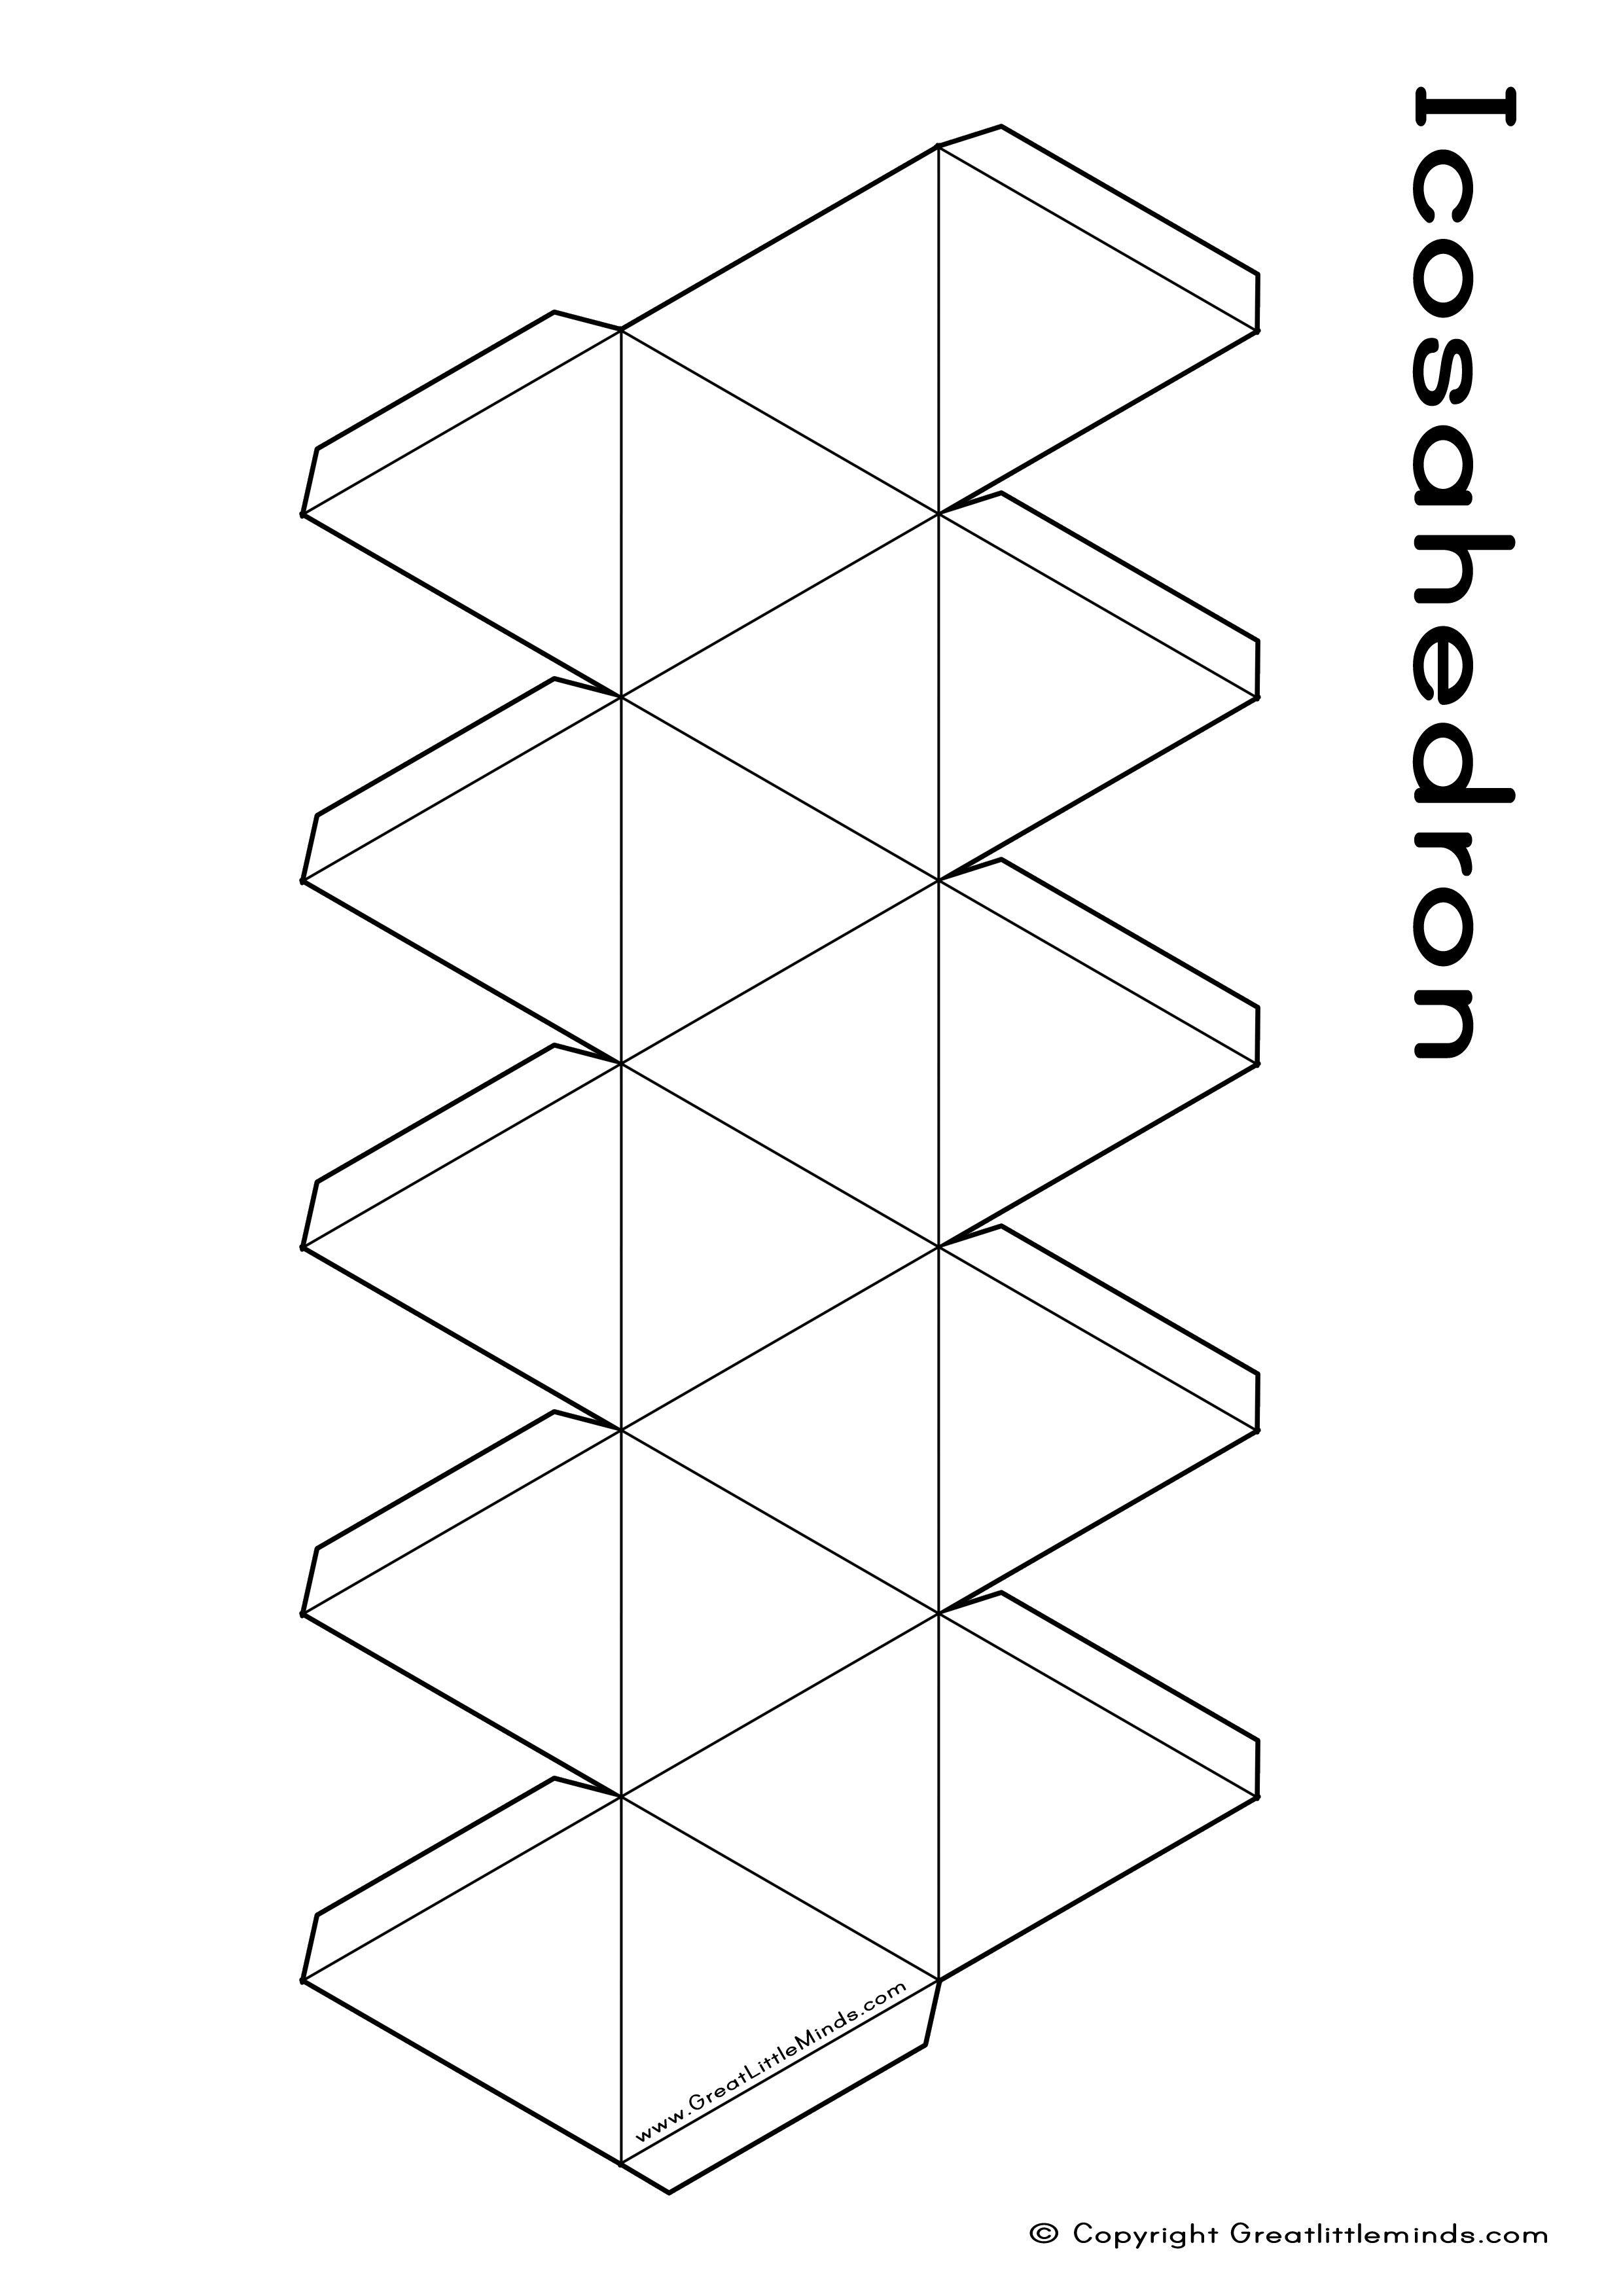 Pin By Kerry Horton On Teacher Room Ideas